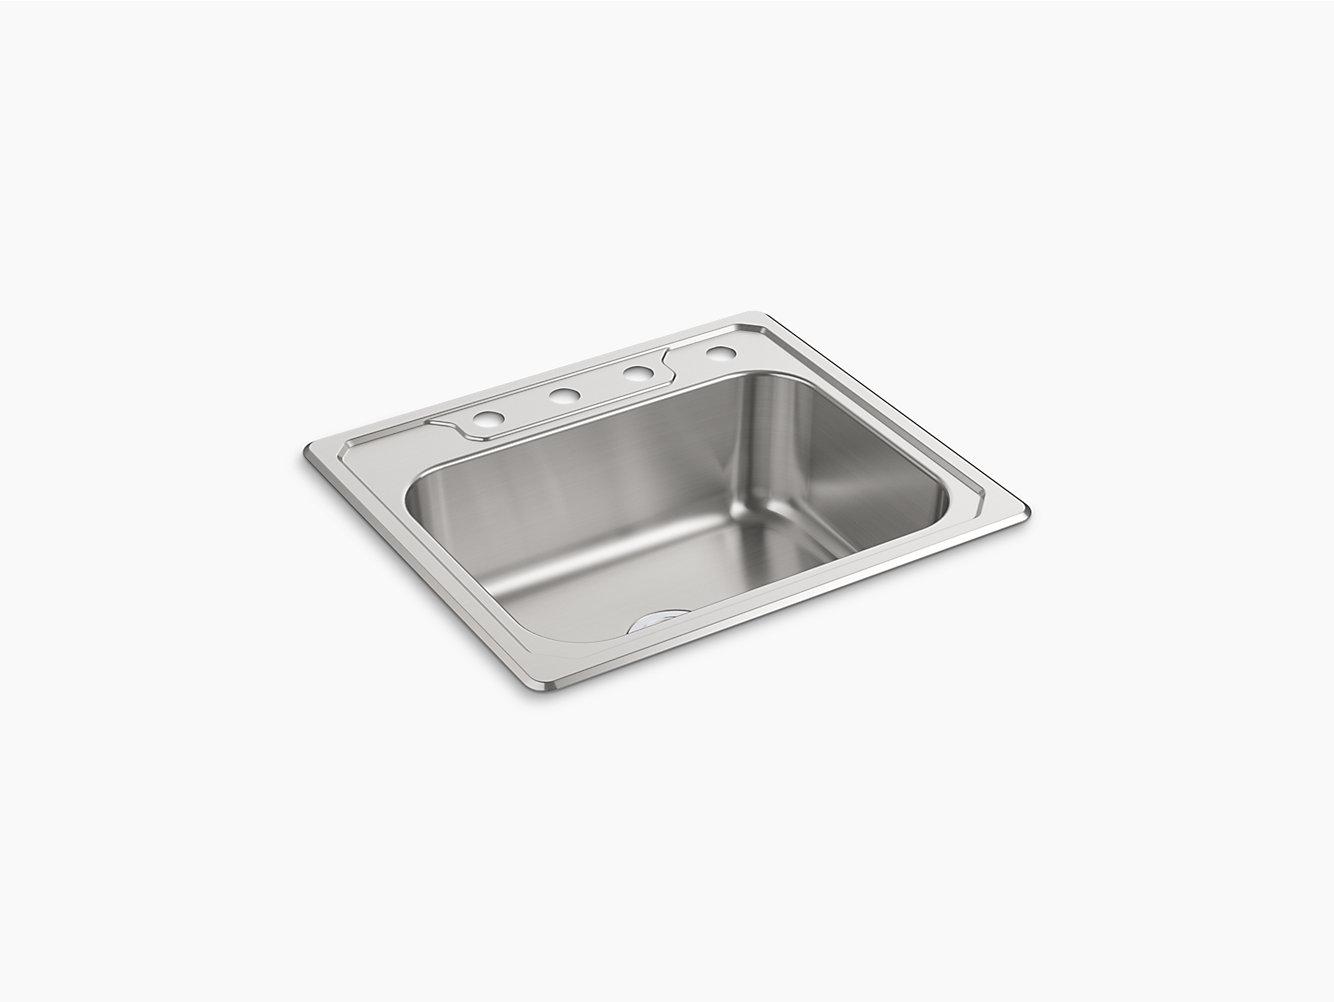 Middleton top mount single bowl kitchen sink 25 x 22 x 8 14711 middleton top mount single bowl kitchen sink 25 x 22 x 8 14711 4 na sterling workwithnaturefo